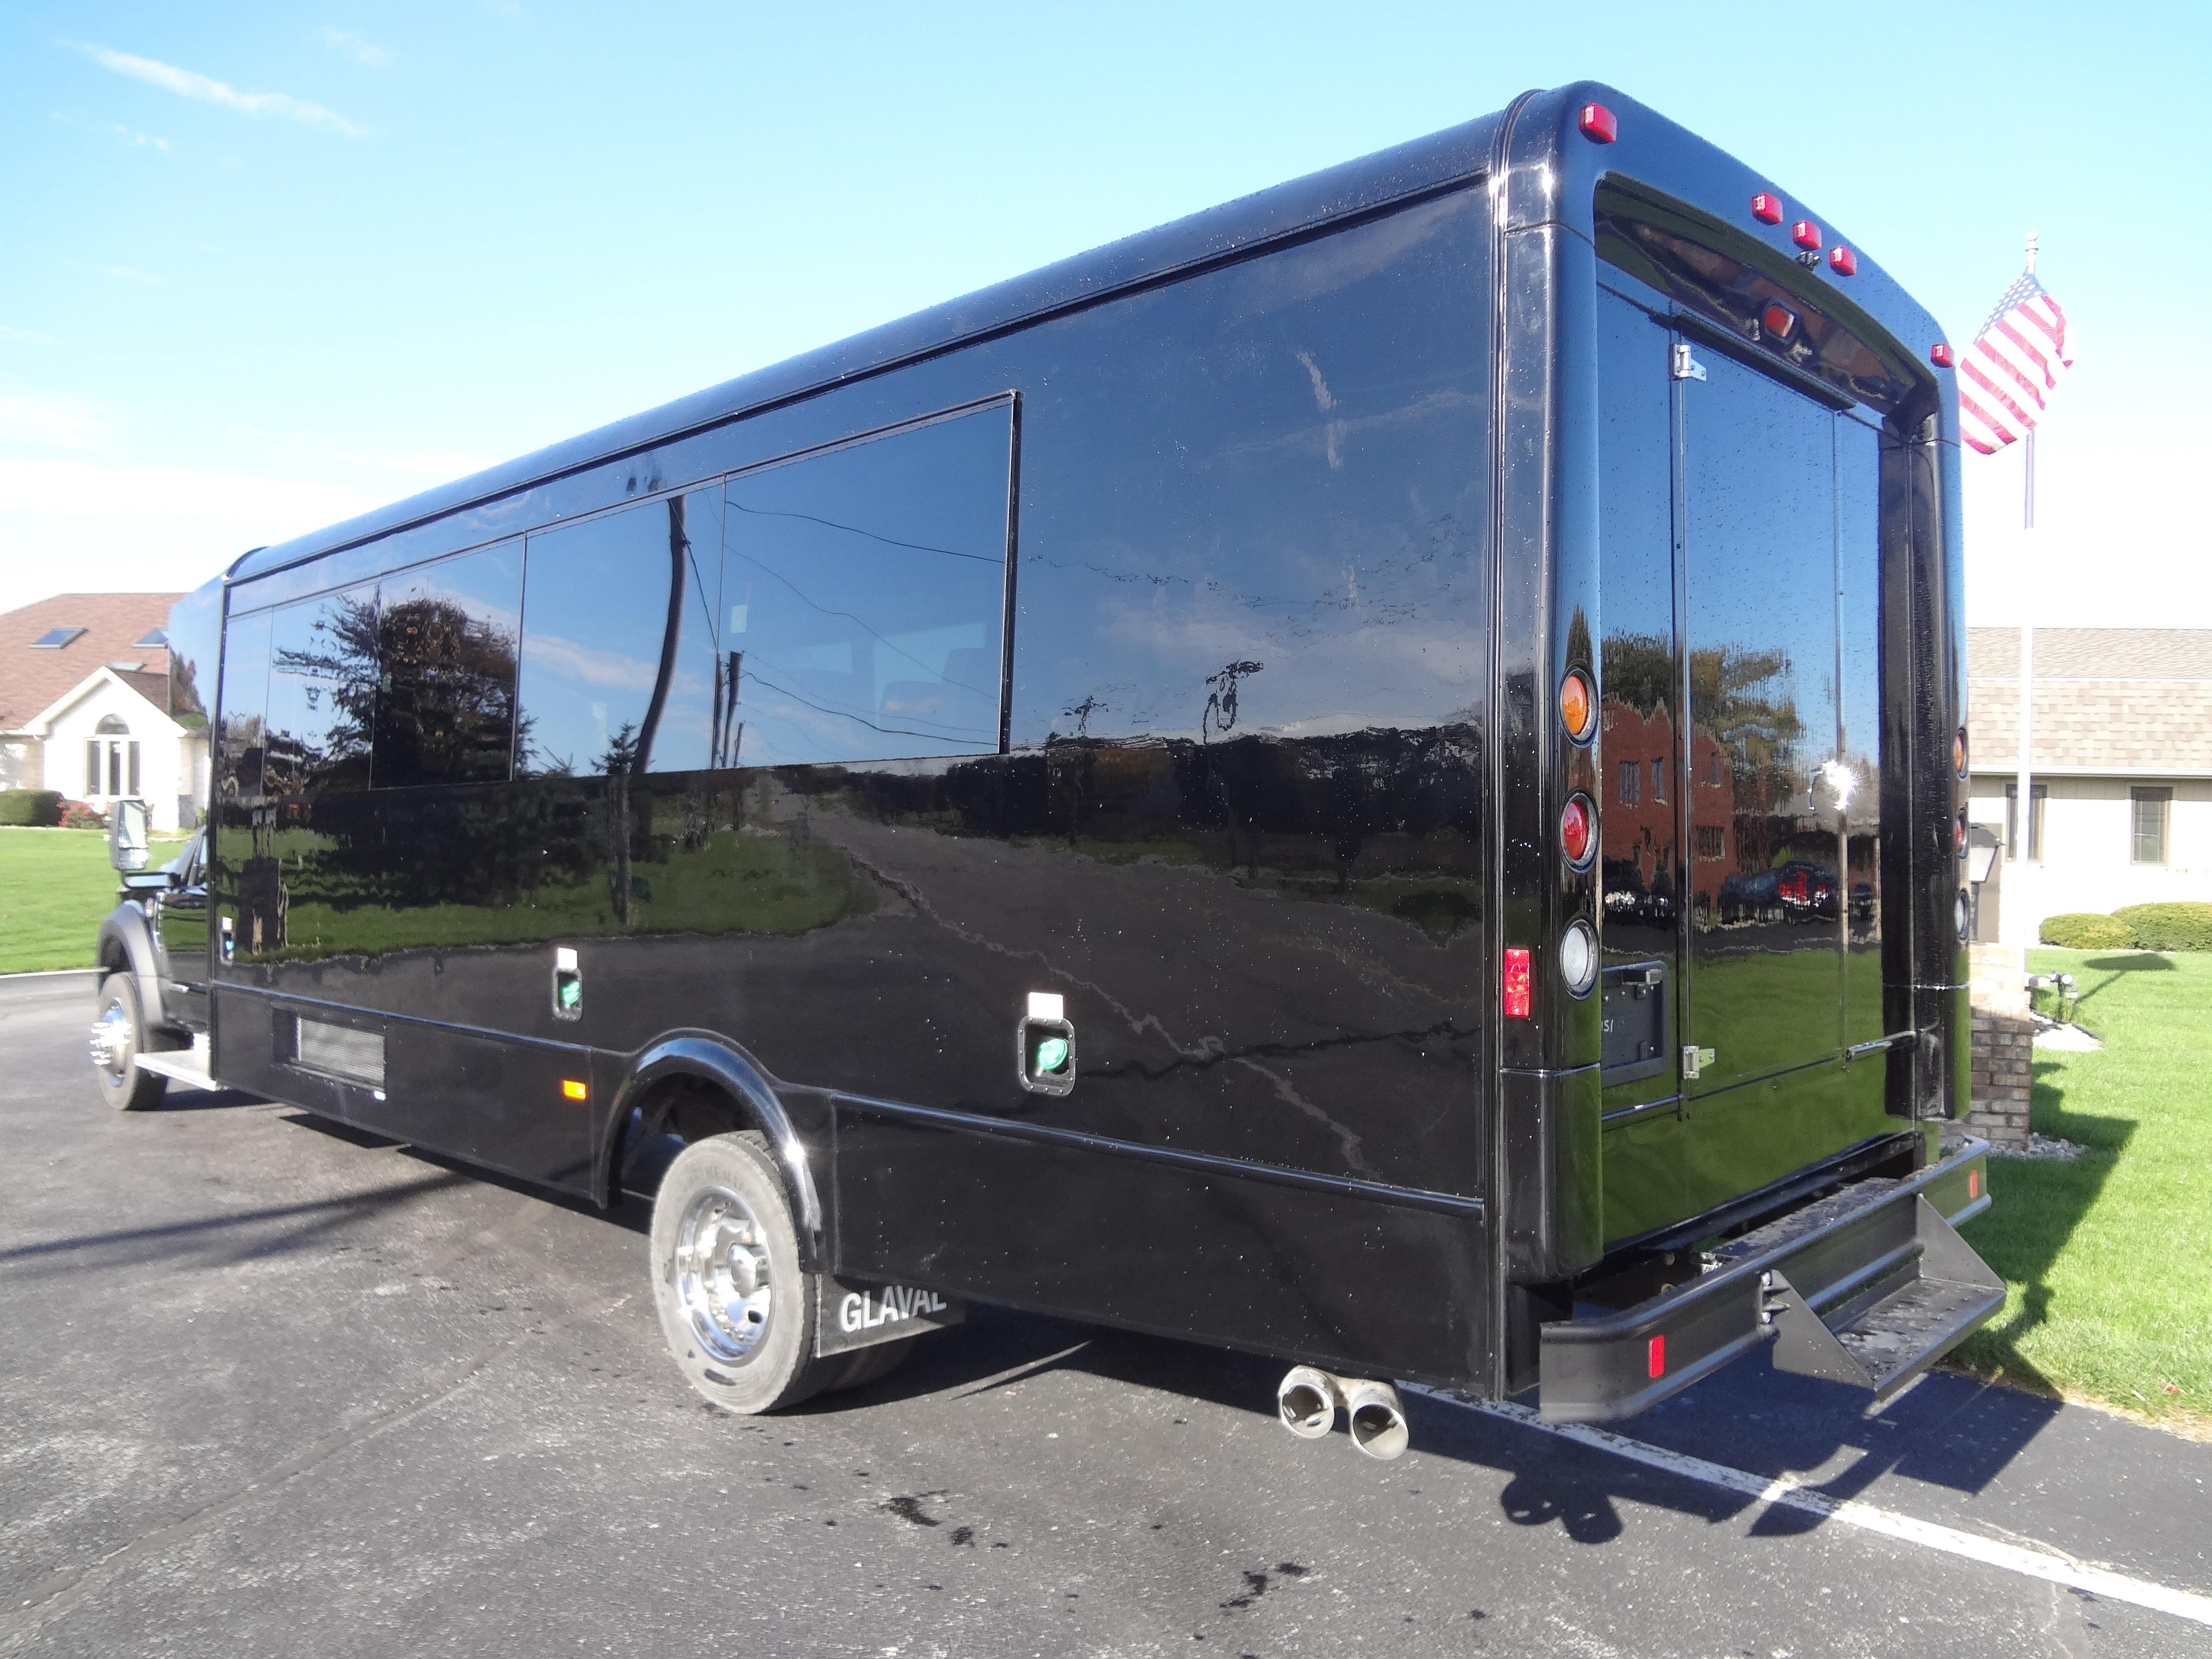 [SCHEMATICS_48ZD]  2017 Glaval Entourage Ford 29 Passengers and 0 Wheelchairs | Glaval Bus Wiring Diagram |  | Tesco Bus